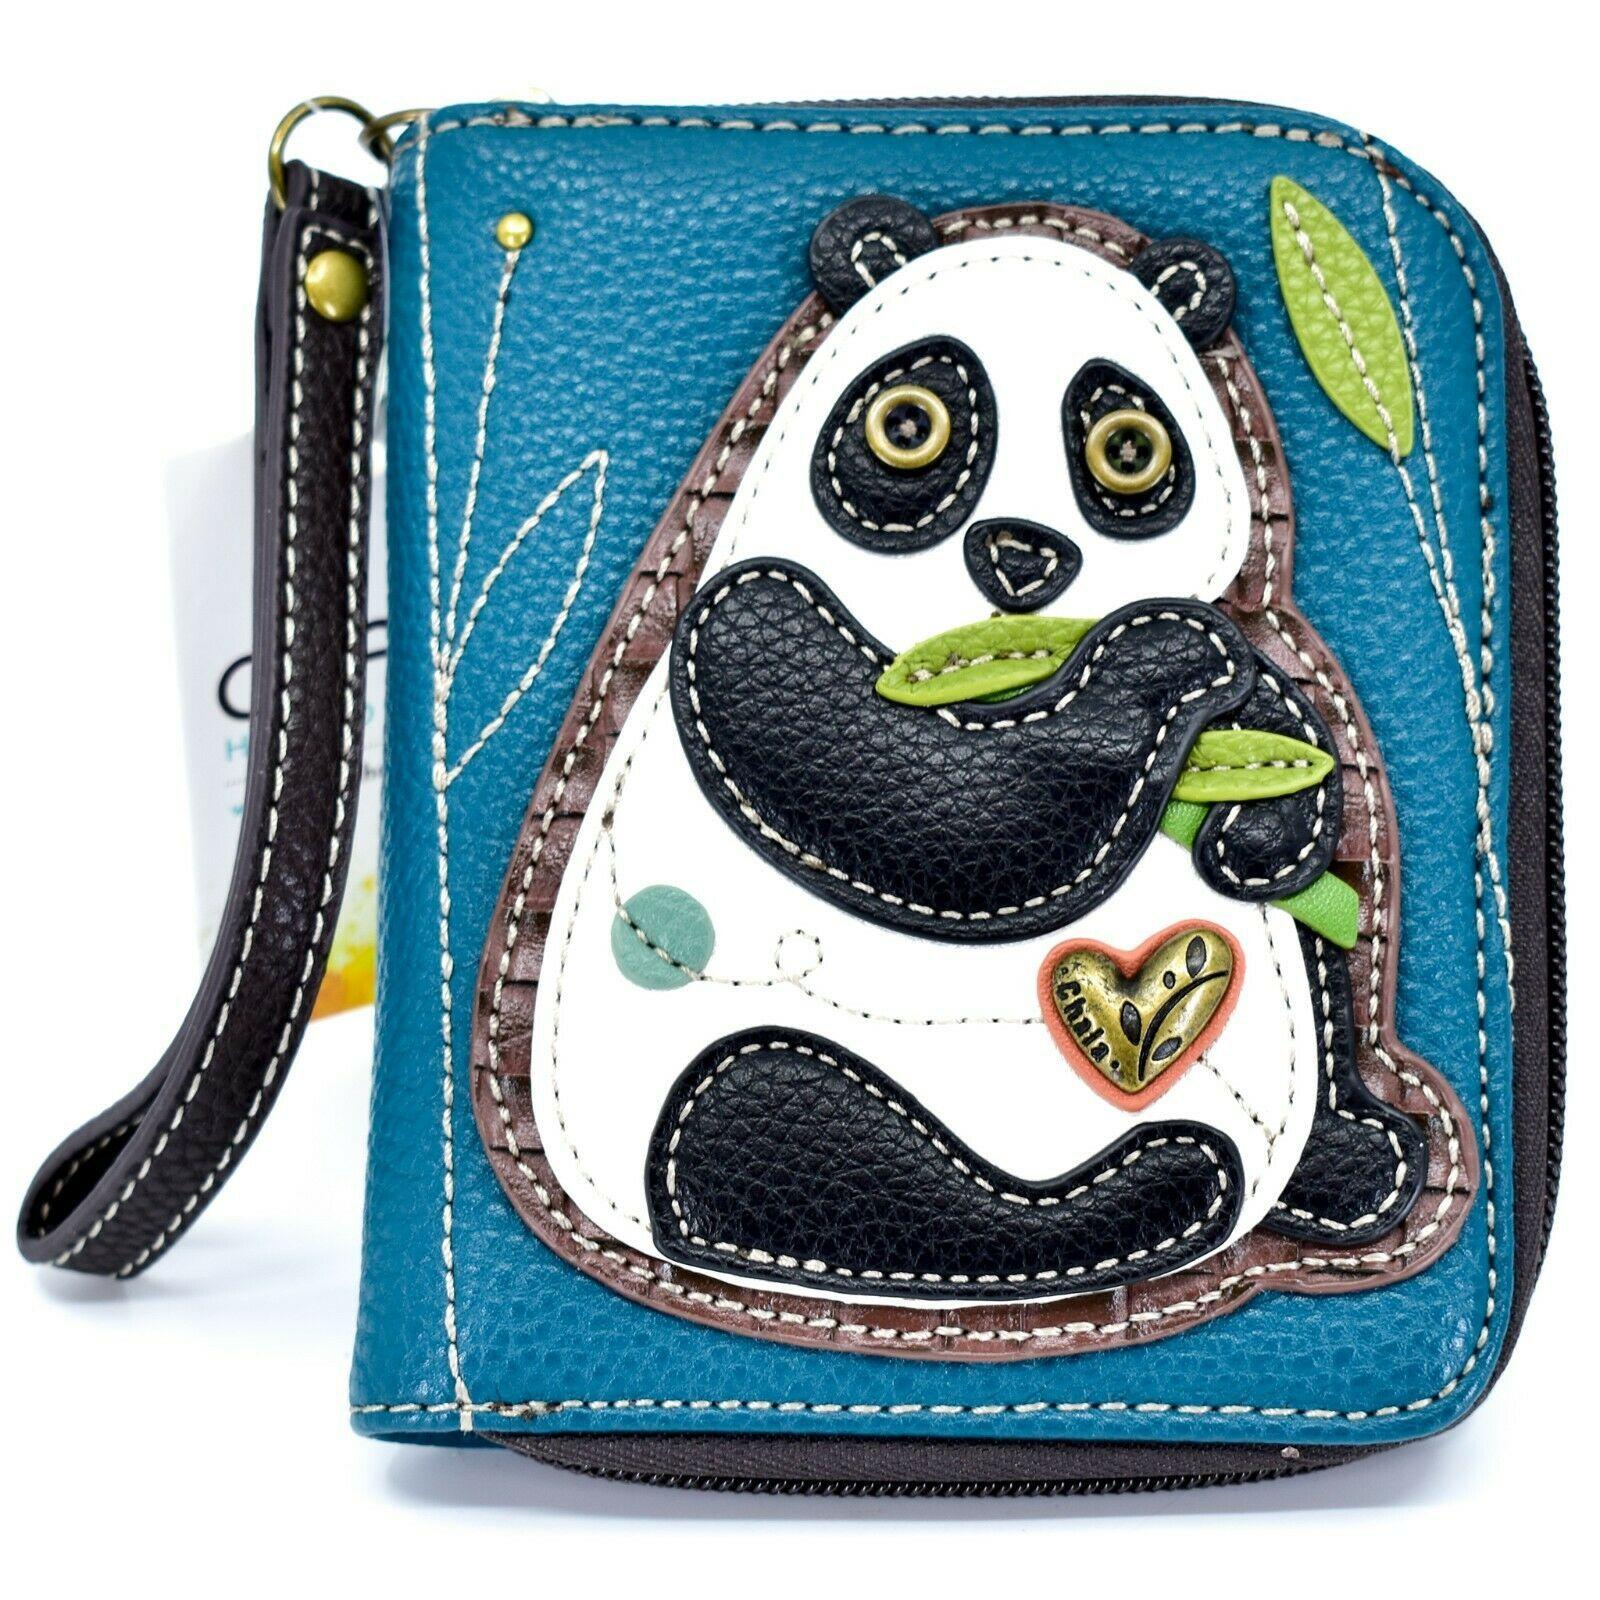 Chala Handbags Faux Leather Panda Turquoise Blue Zip Around Wristlet Wallet